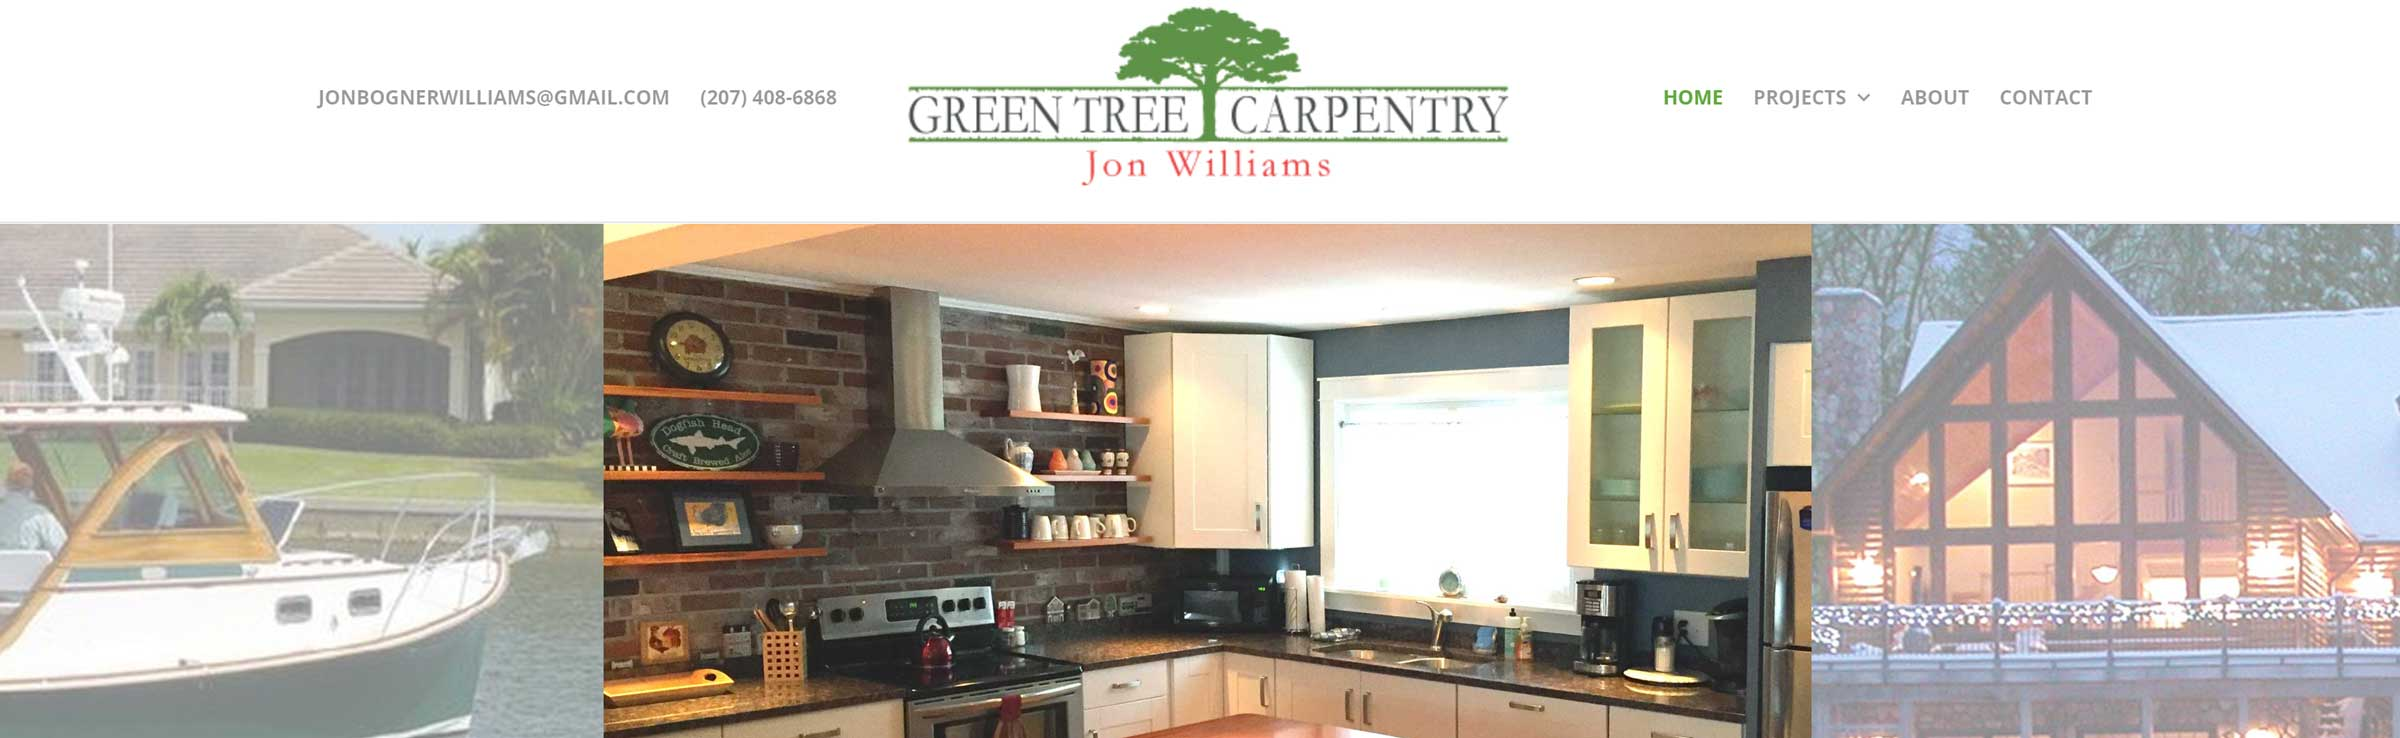 Green Tree Carpentry banner